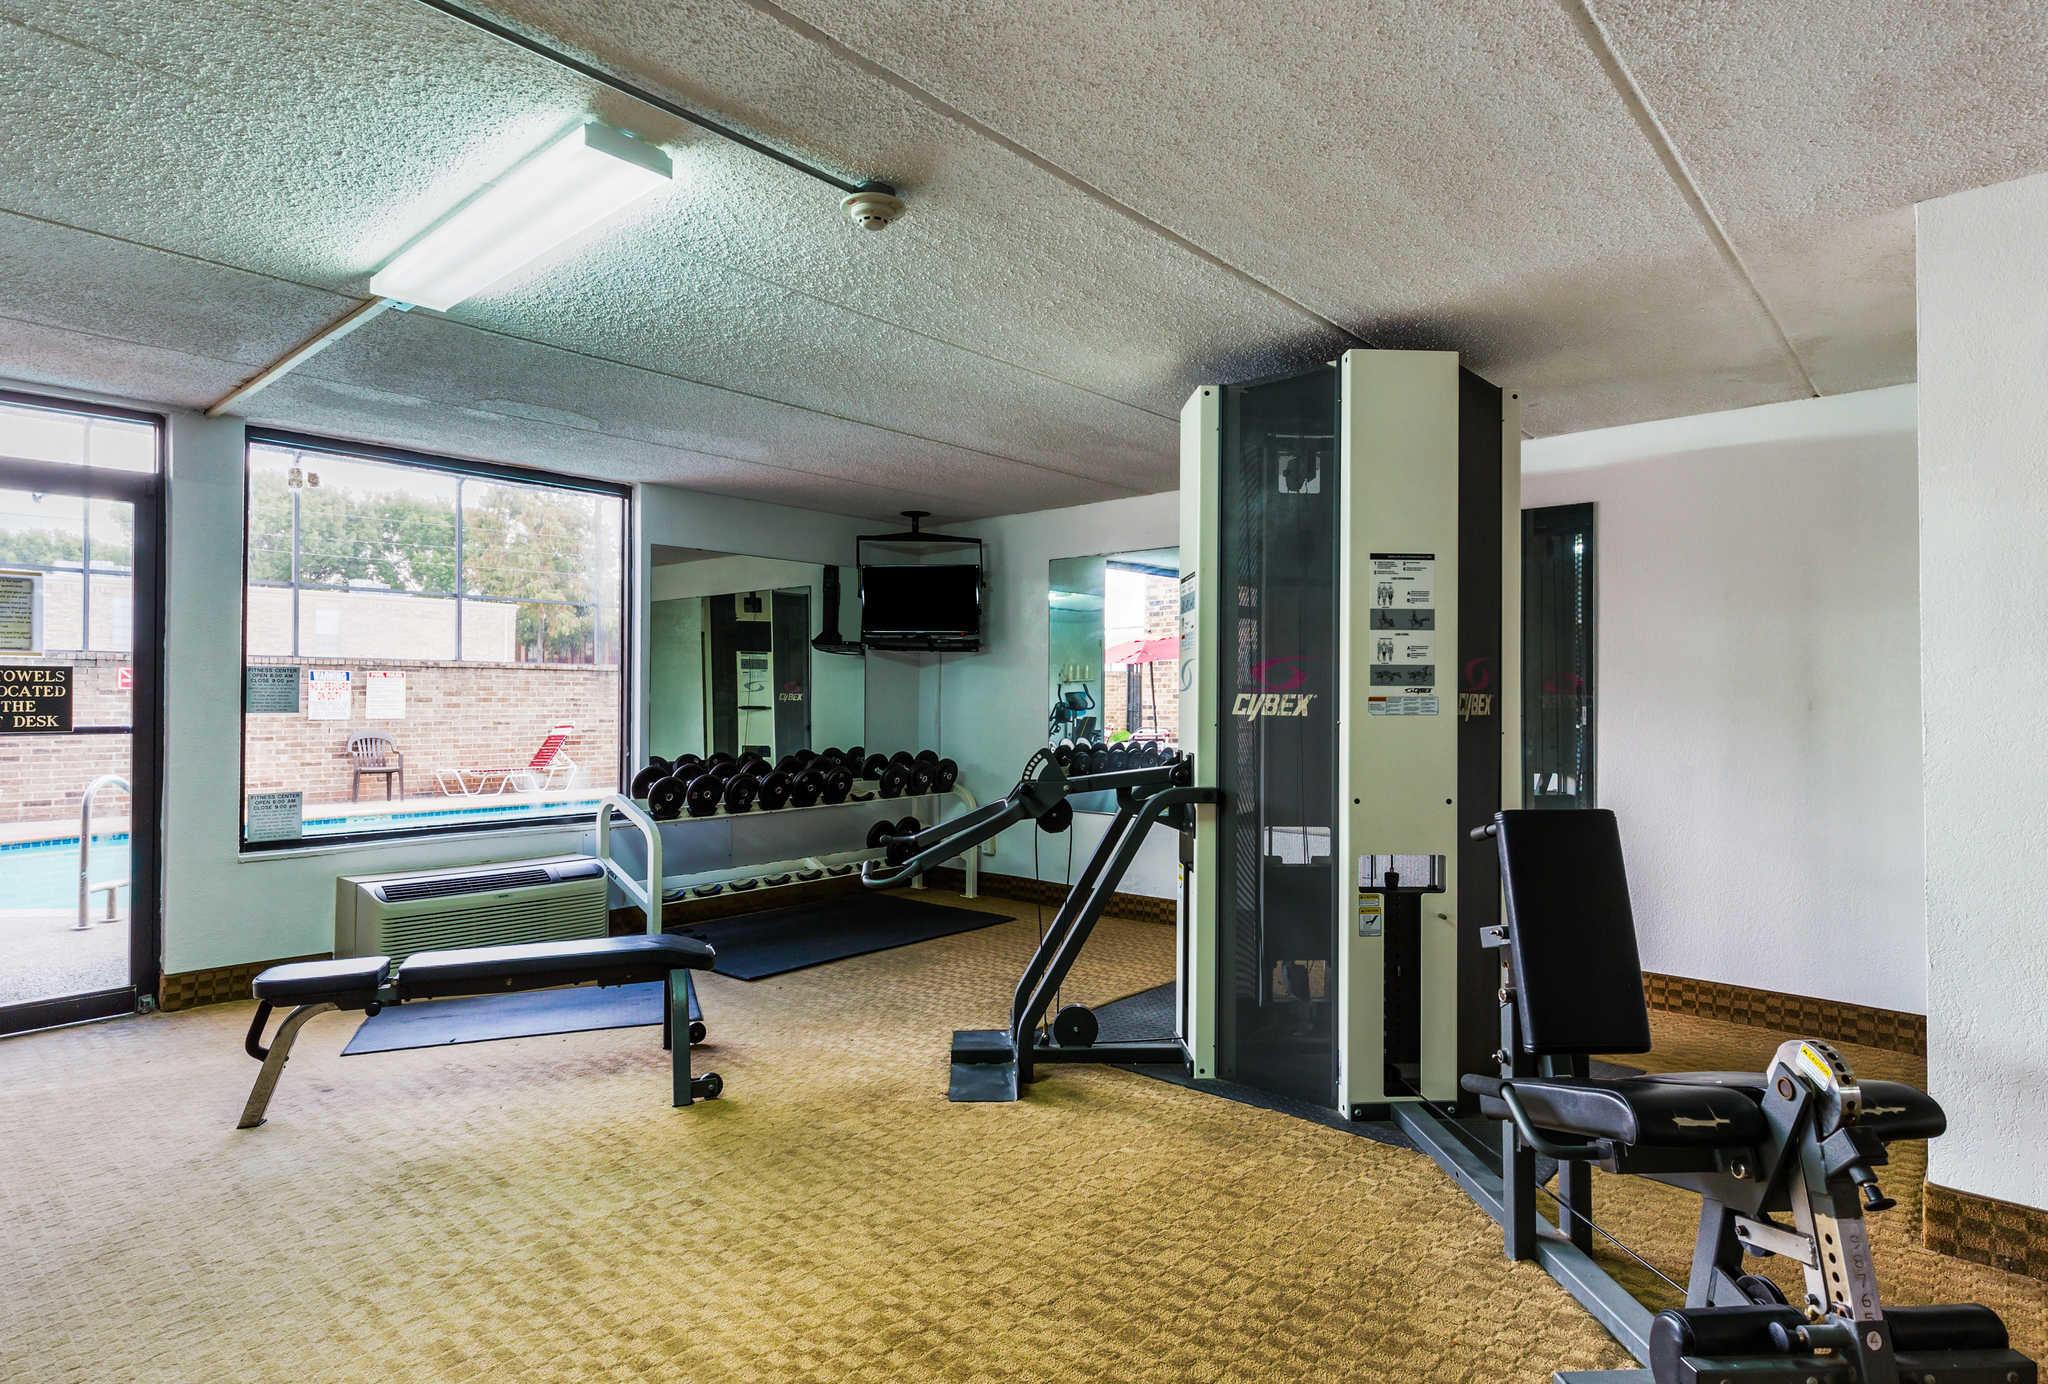 Clarion Inn image 35